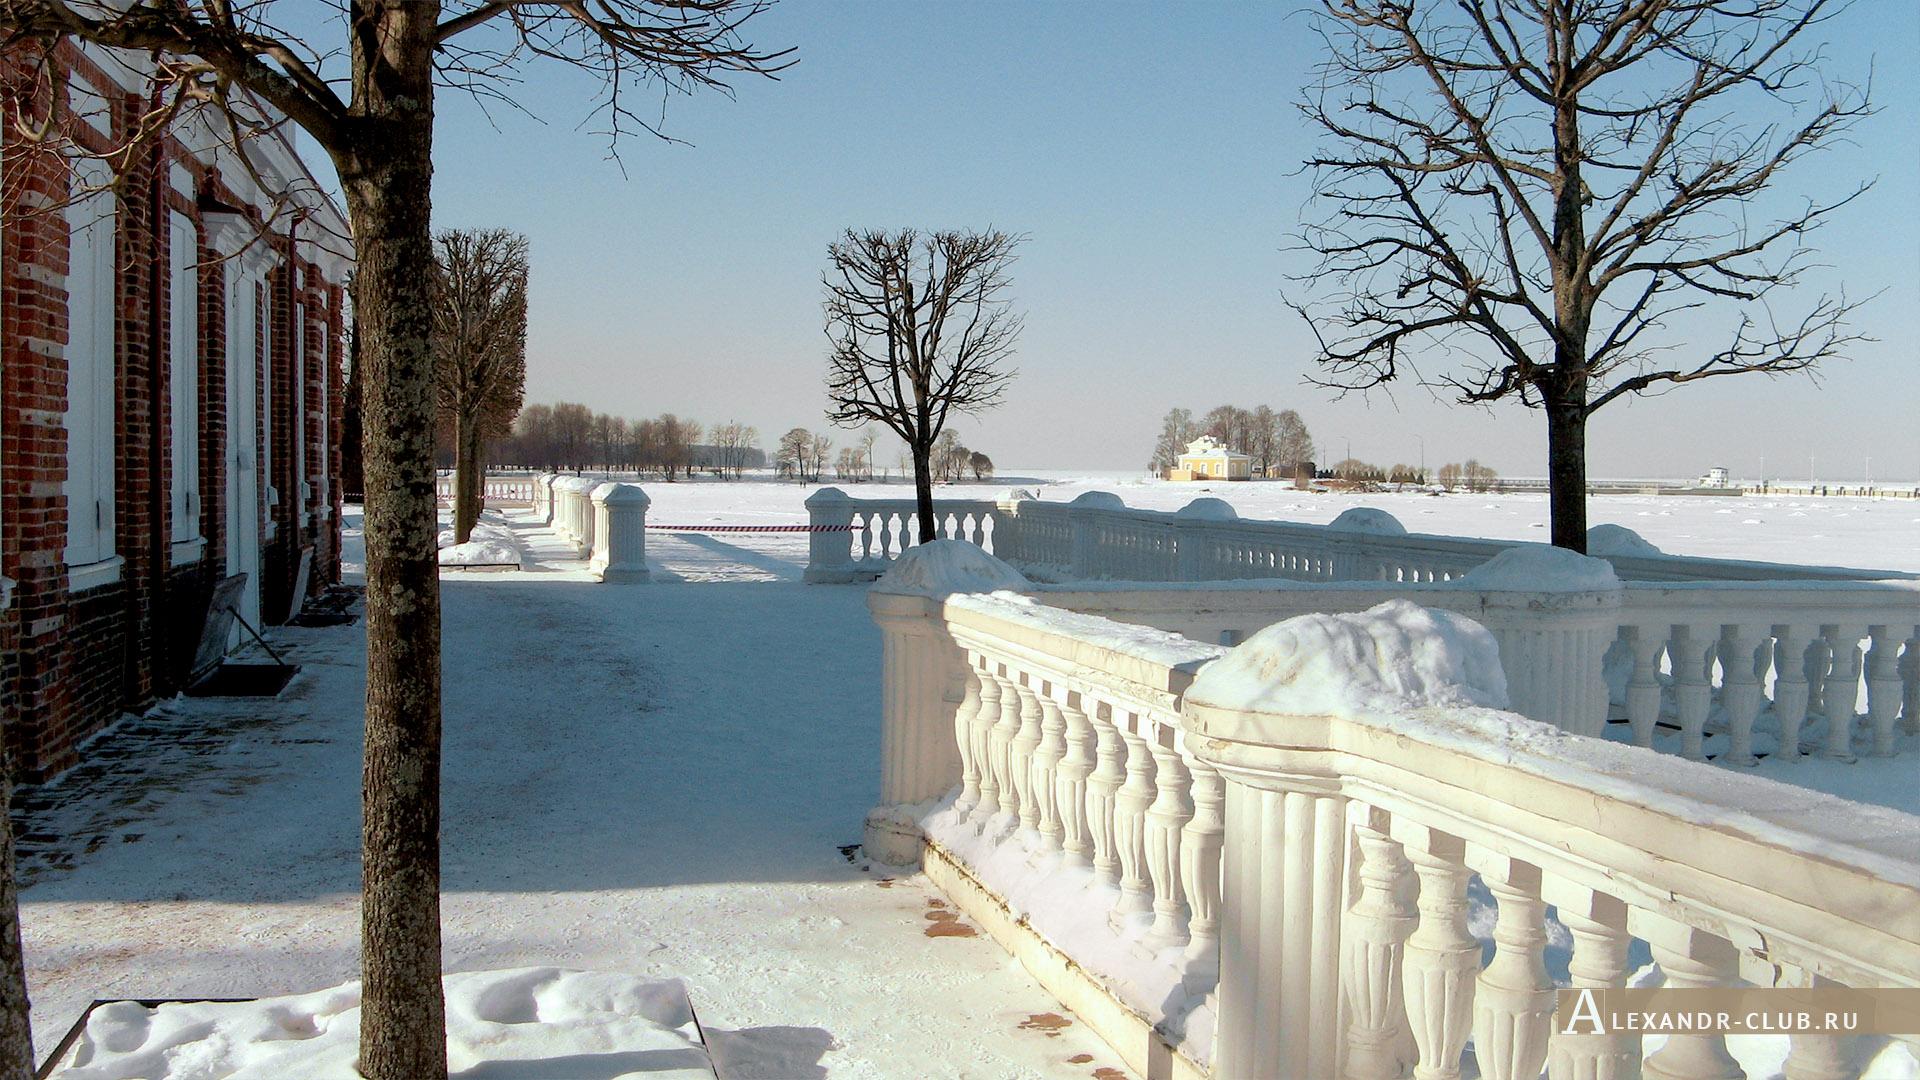 Петергоф, зима, Нижний парк, дворец «Монплезир» – 4